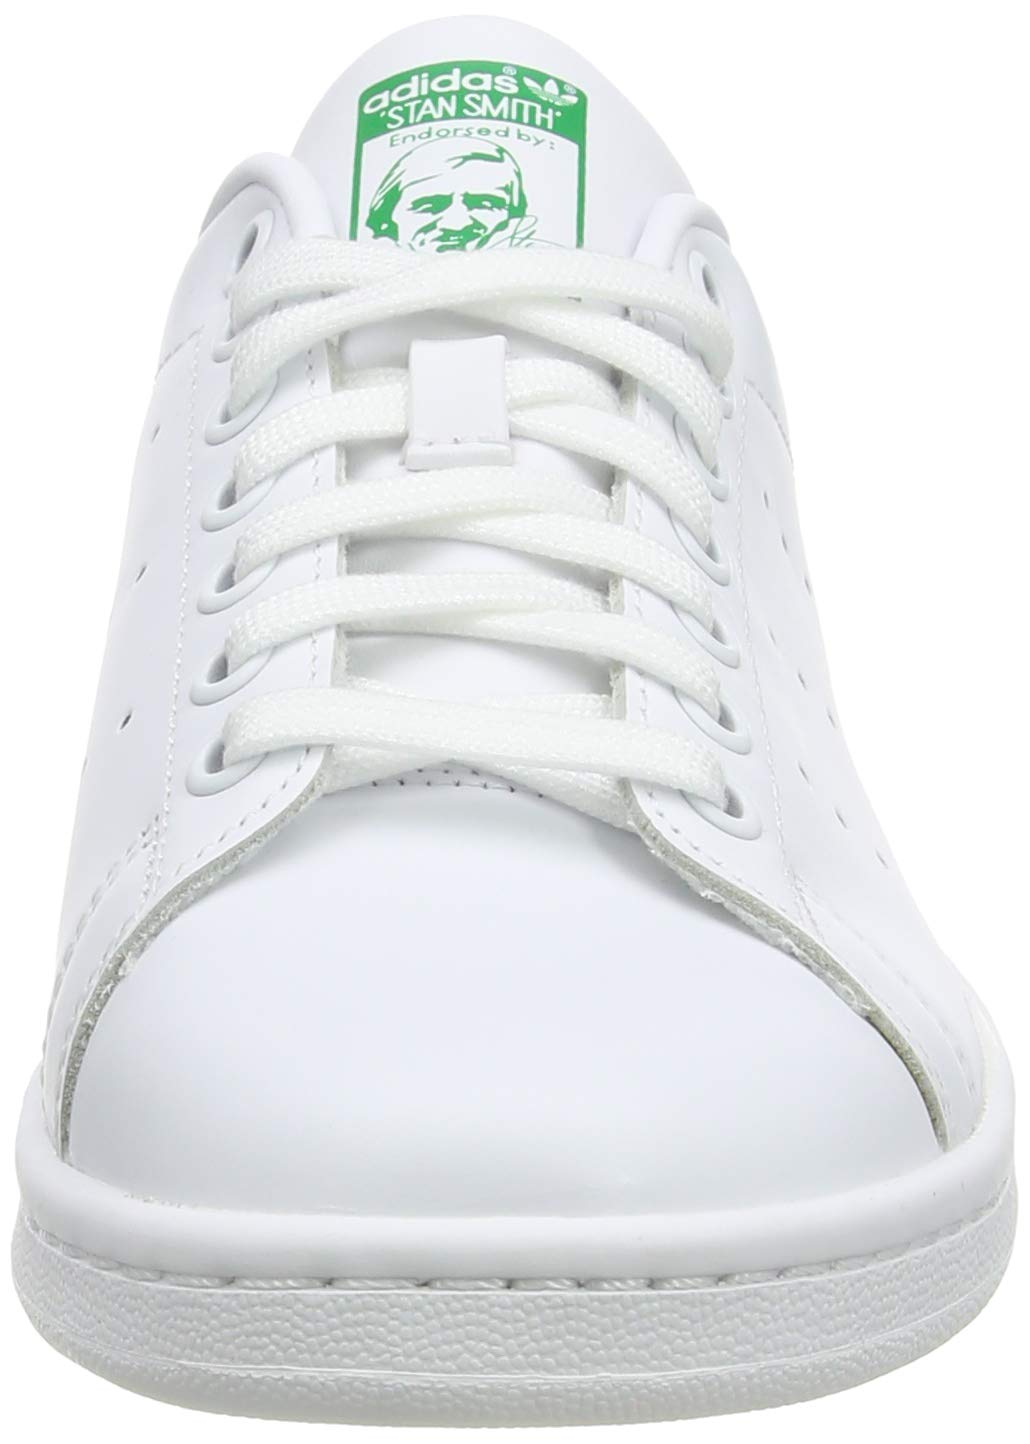 adidas Originals Stan Smith, Scarpe da Ginnastica Unisex – Adulto 4 spesavip